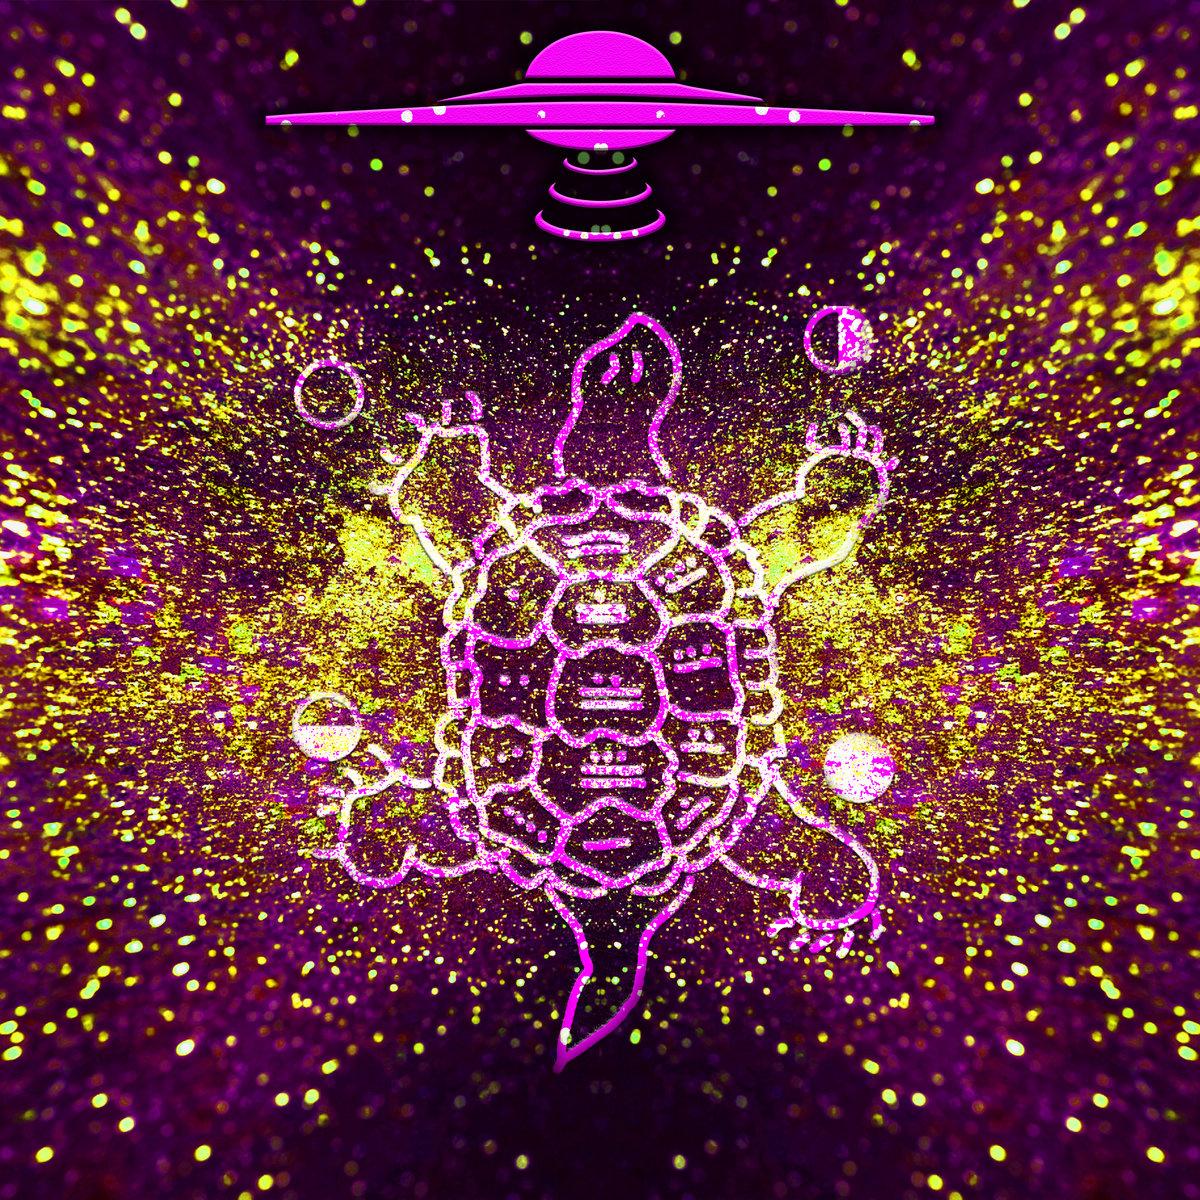 Tomas Gaimaro - Asylum (Original mix) | Alien Rave Music